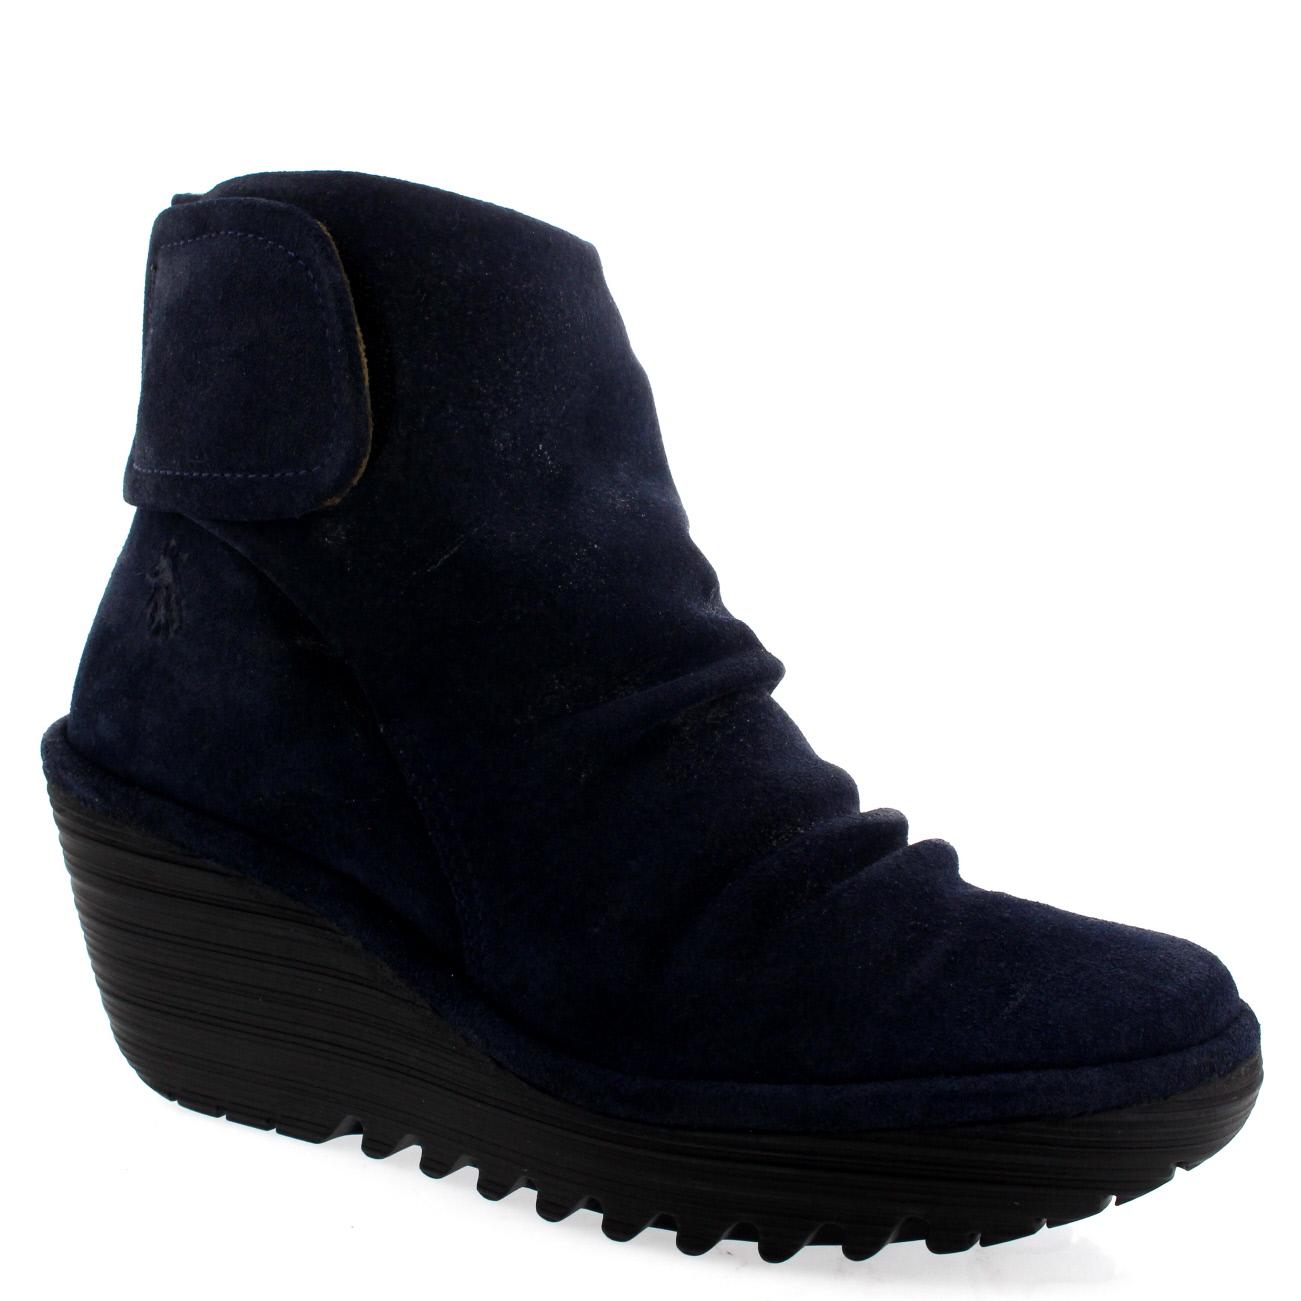 Ladies Fly London Yegi Snow Casual Wedge Shoes Winter Low